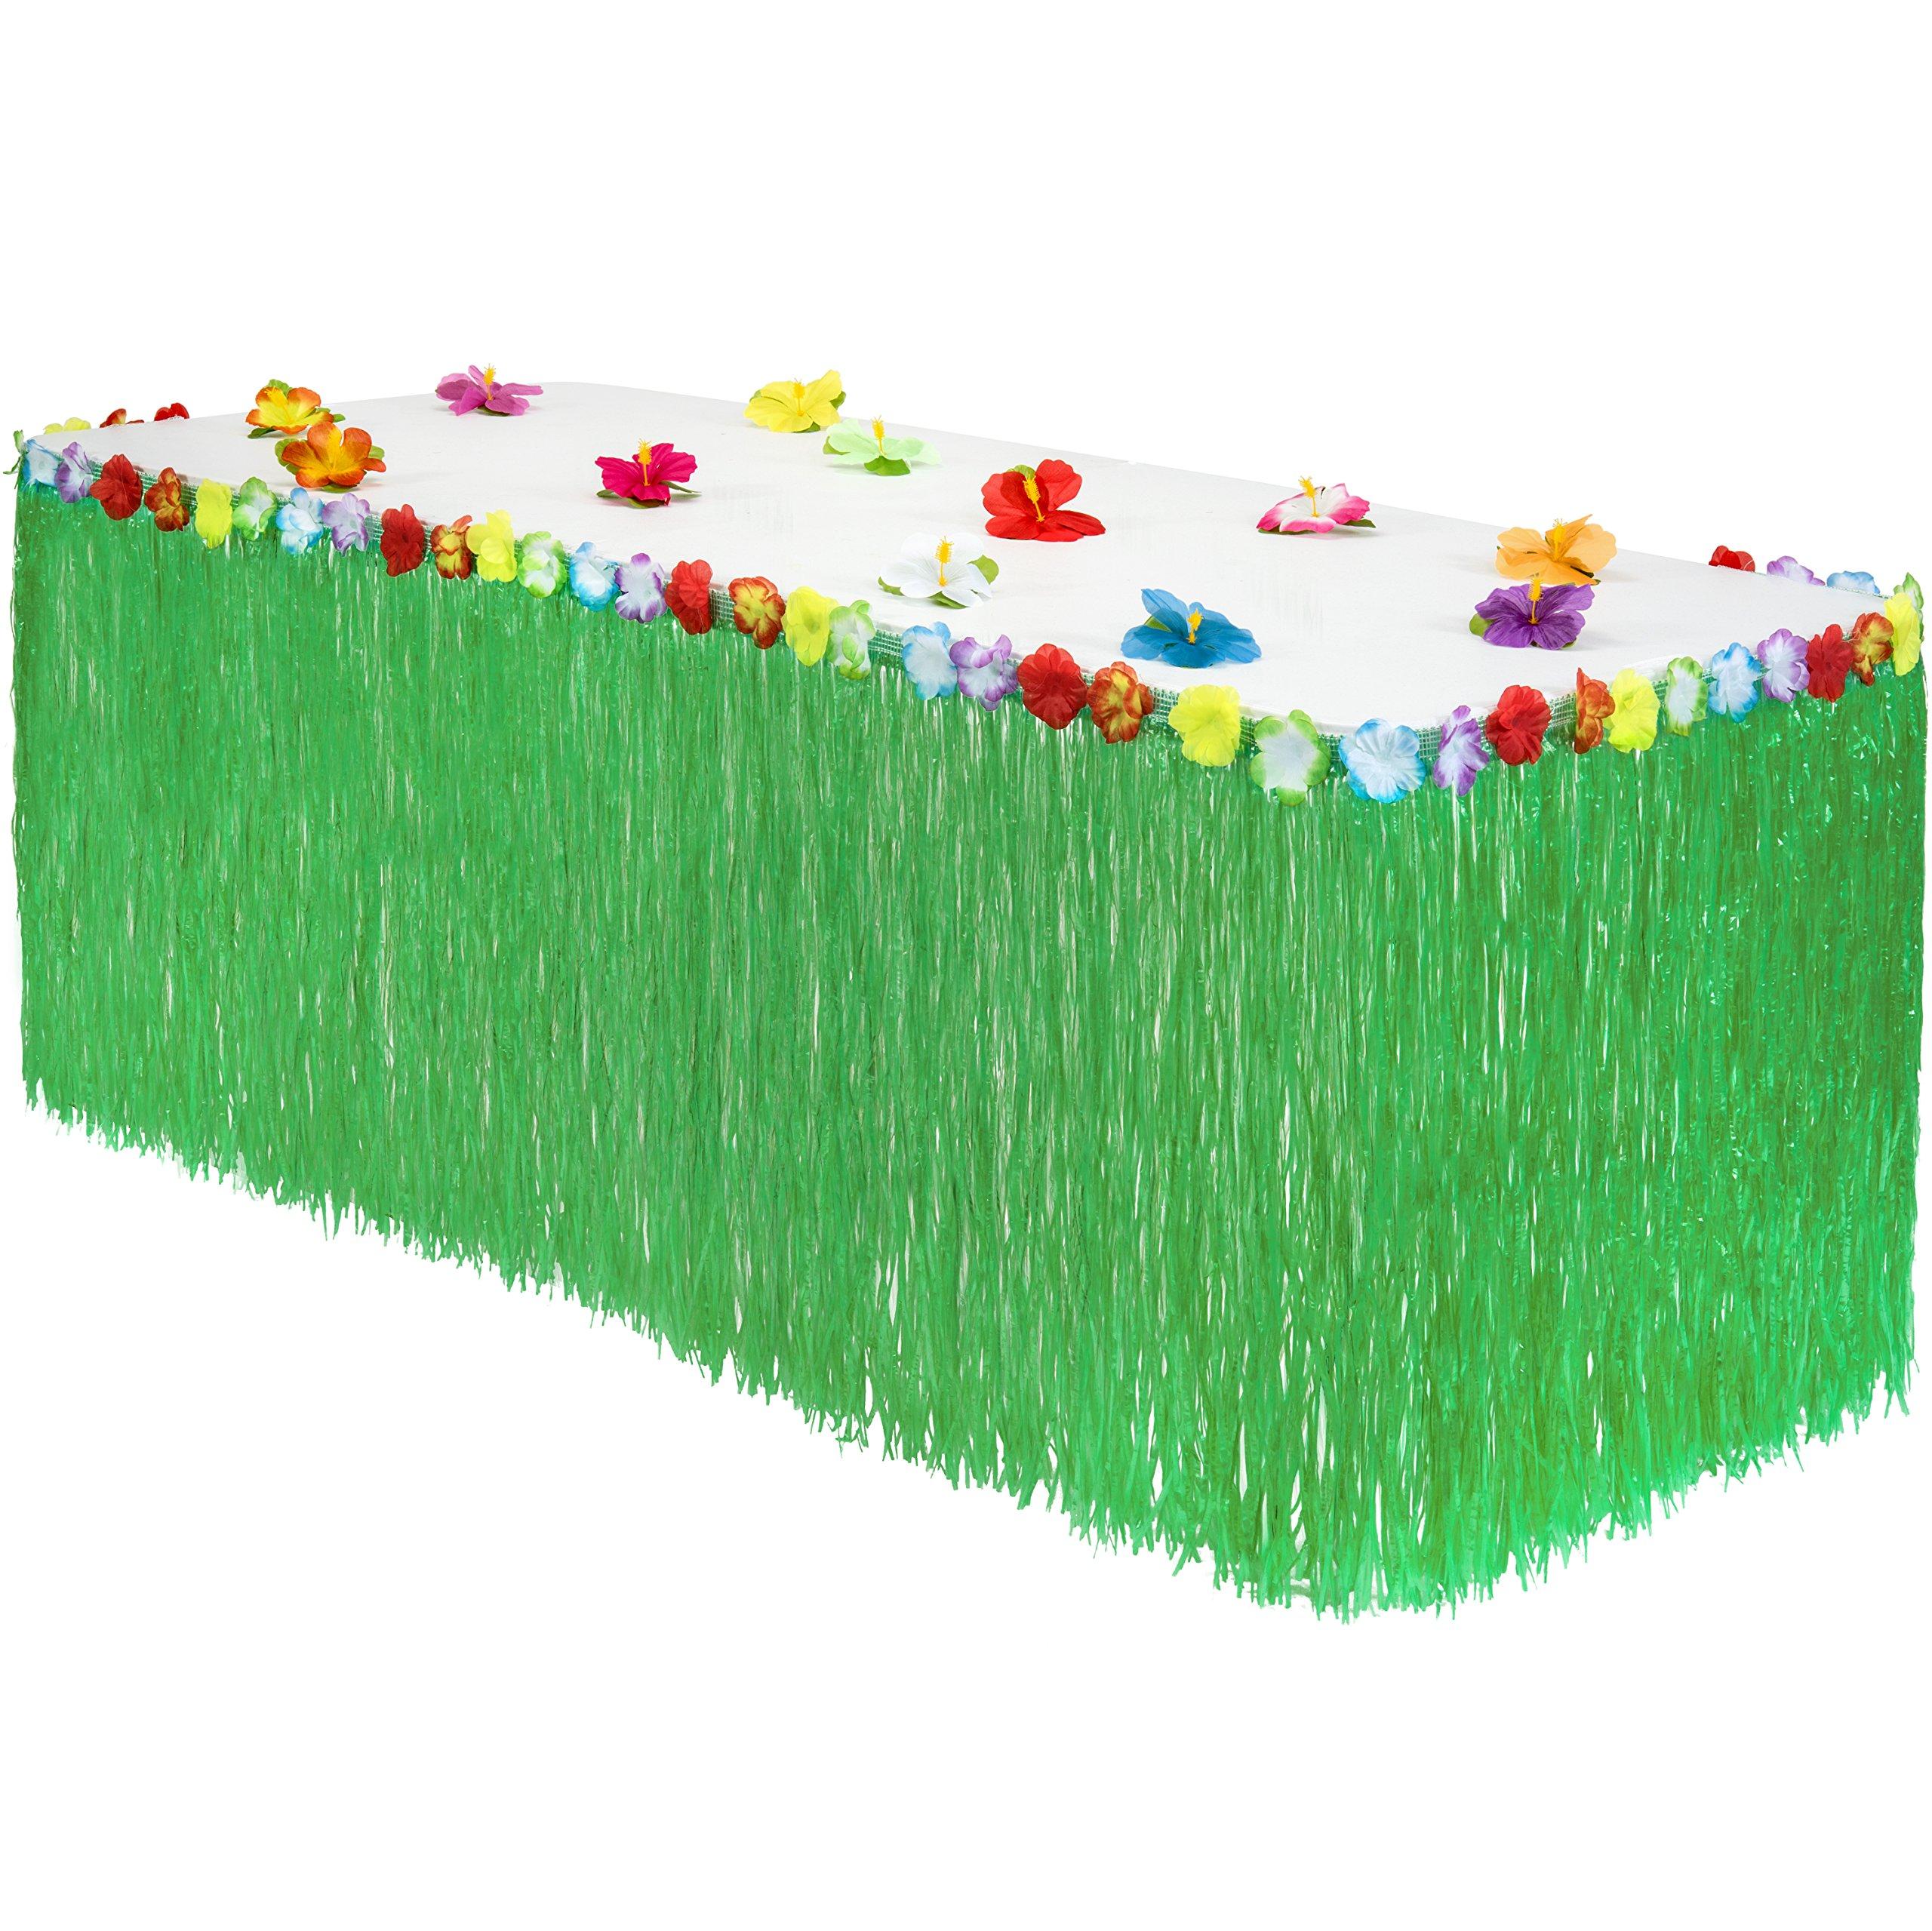 Hawaiian Luau Grass Table Skirt: BONUS 12 Hibiscus Flowers | Includes Adhesive | Perfect Beach, Tiki, Tropical, Island, Party, Luau Decoration 9ft by Luau Essentials